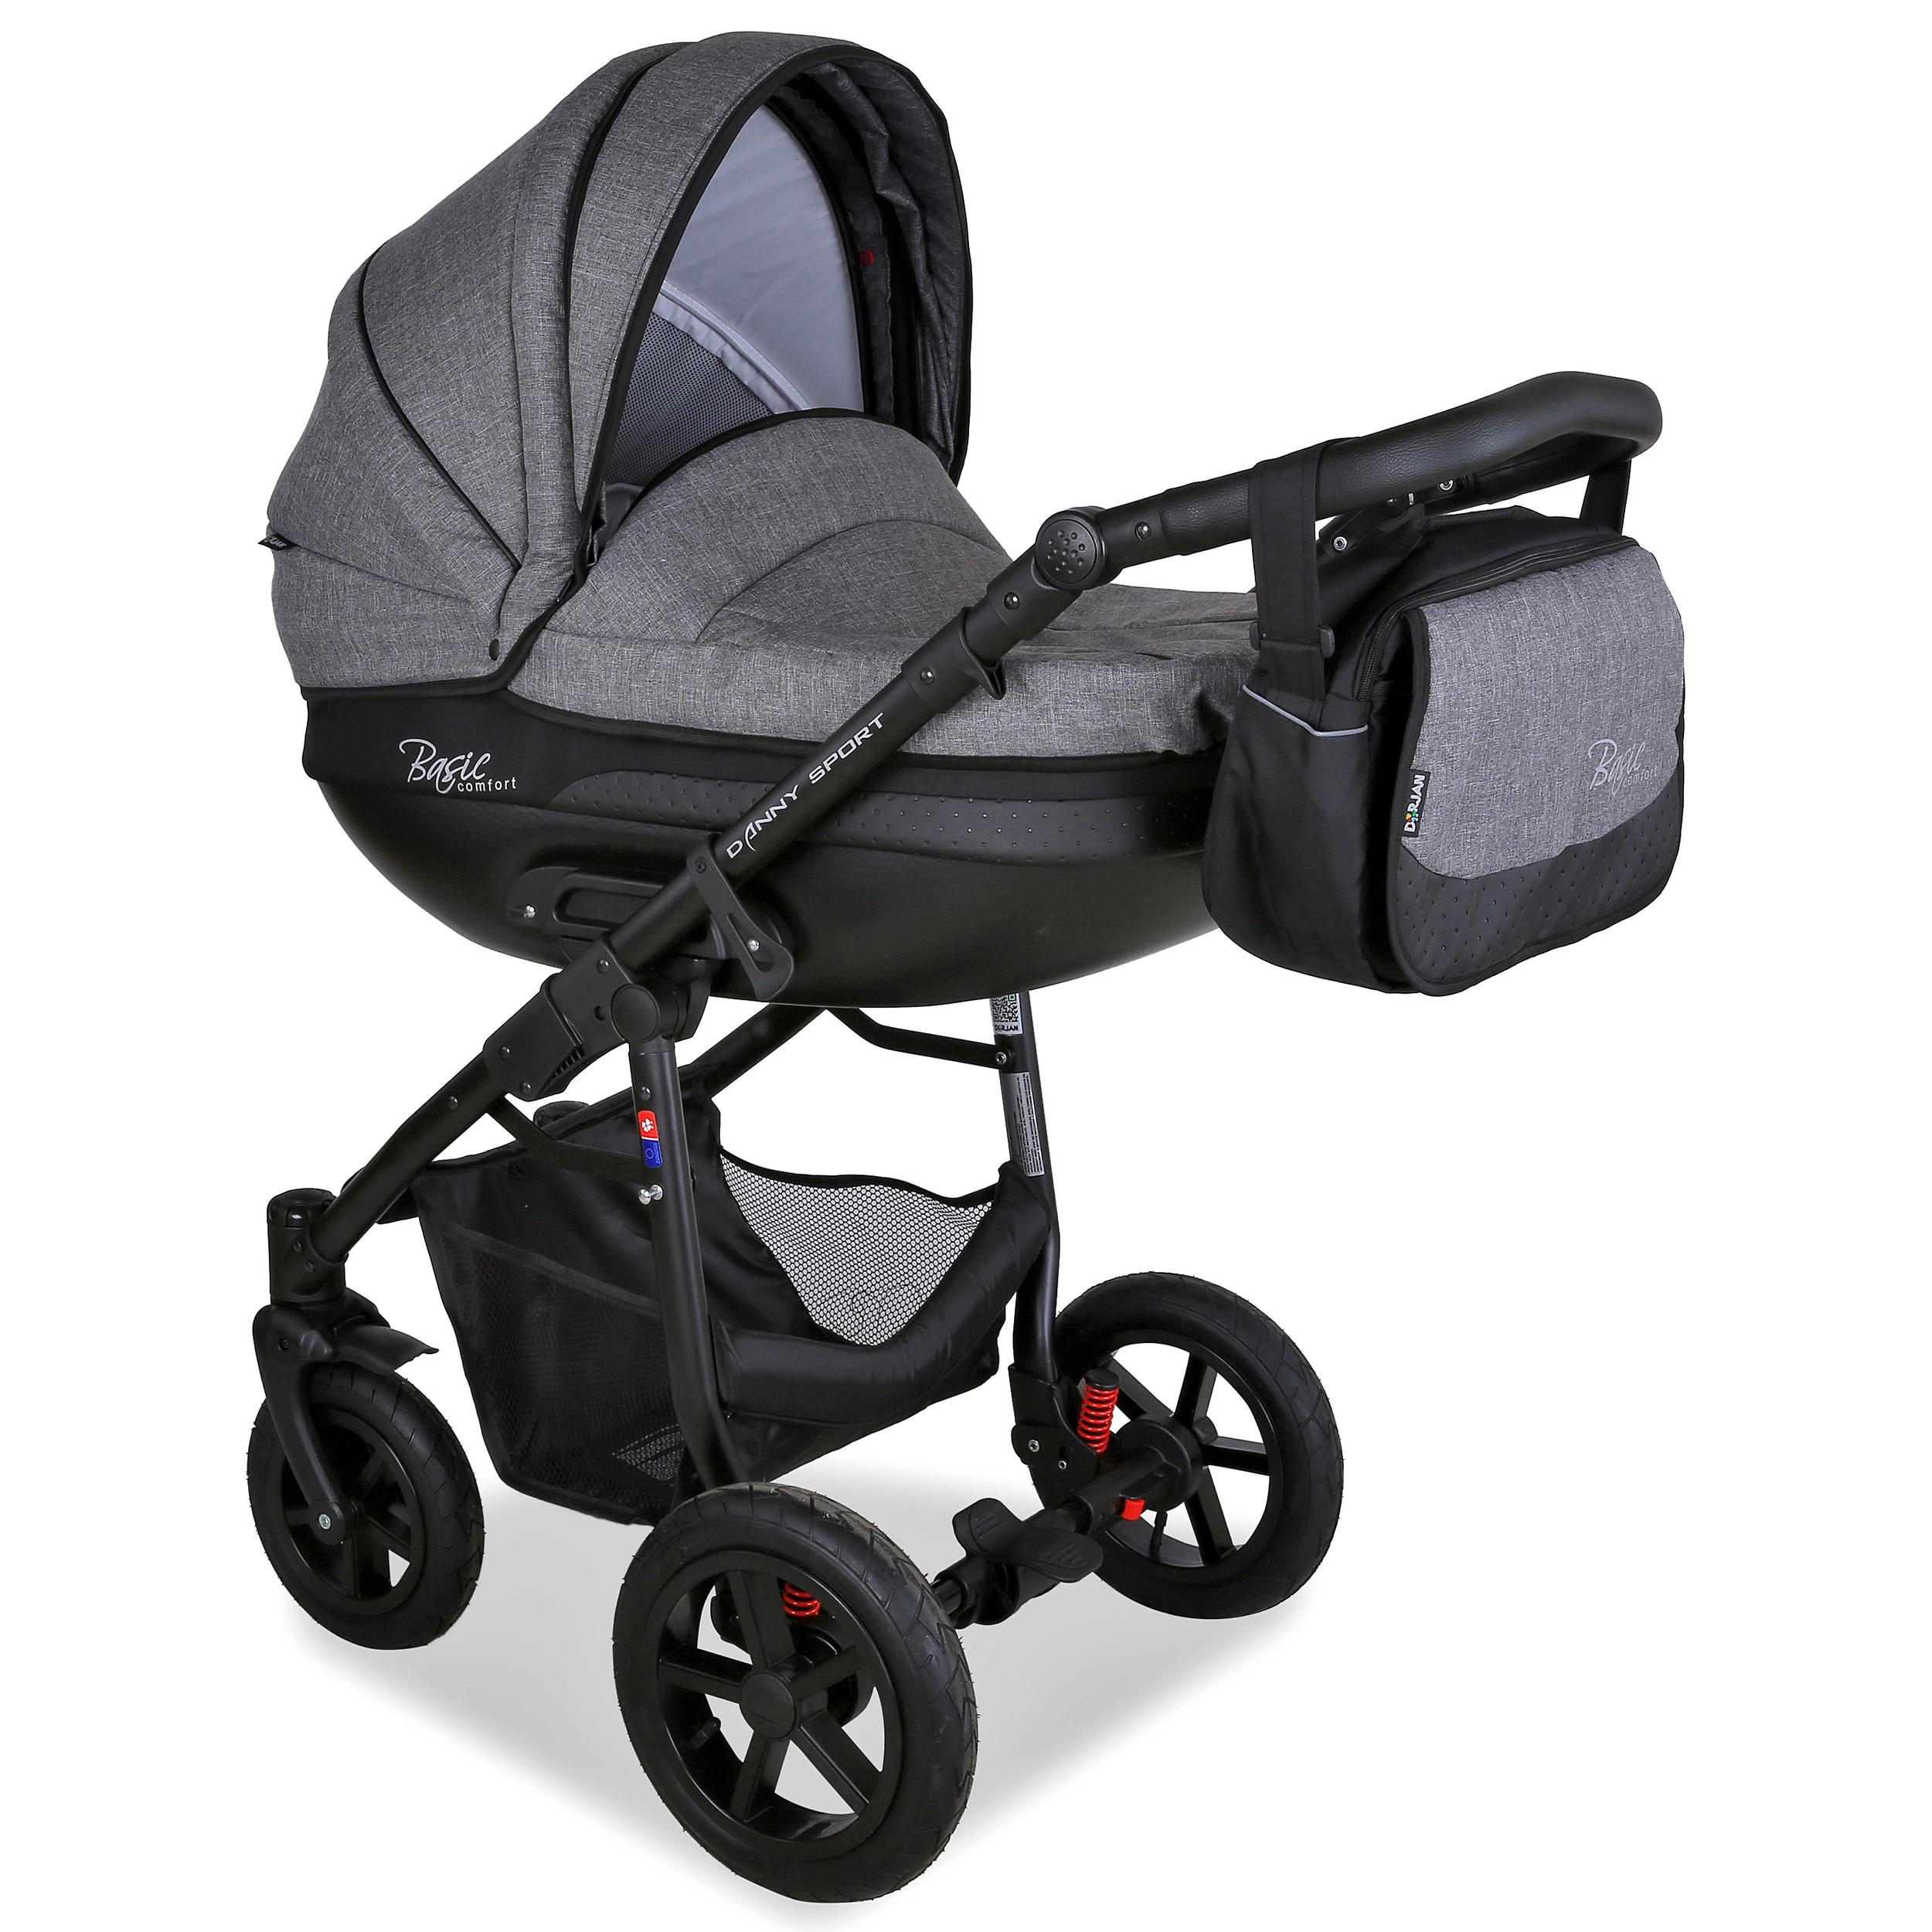 Kinderwagen Kombi 3-in-1 Alu Buggy Autositz Babywanne Babyschale  Multifunktiona